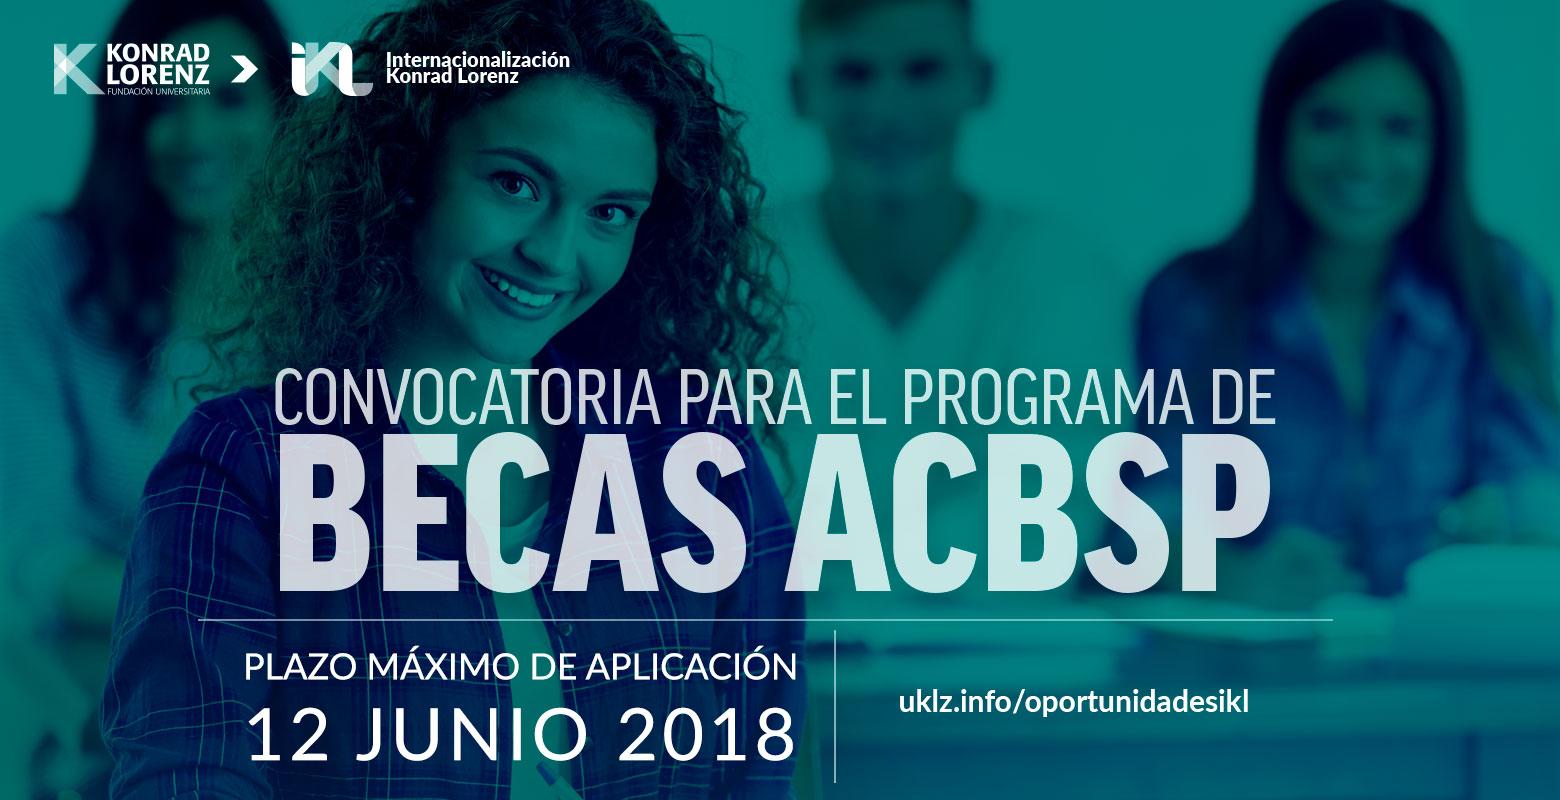 Convocatoria para el programa de becas de ACBSP